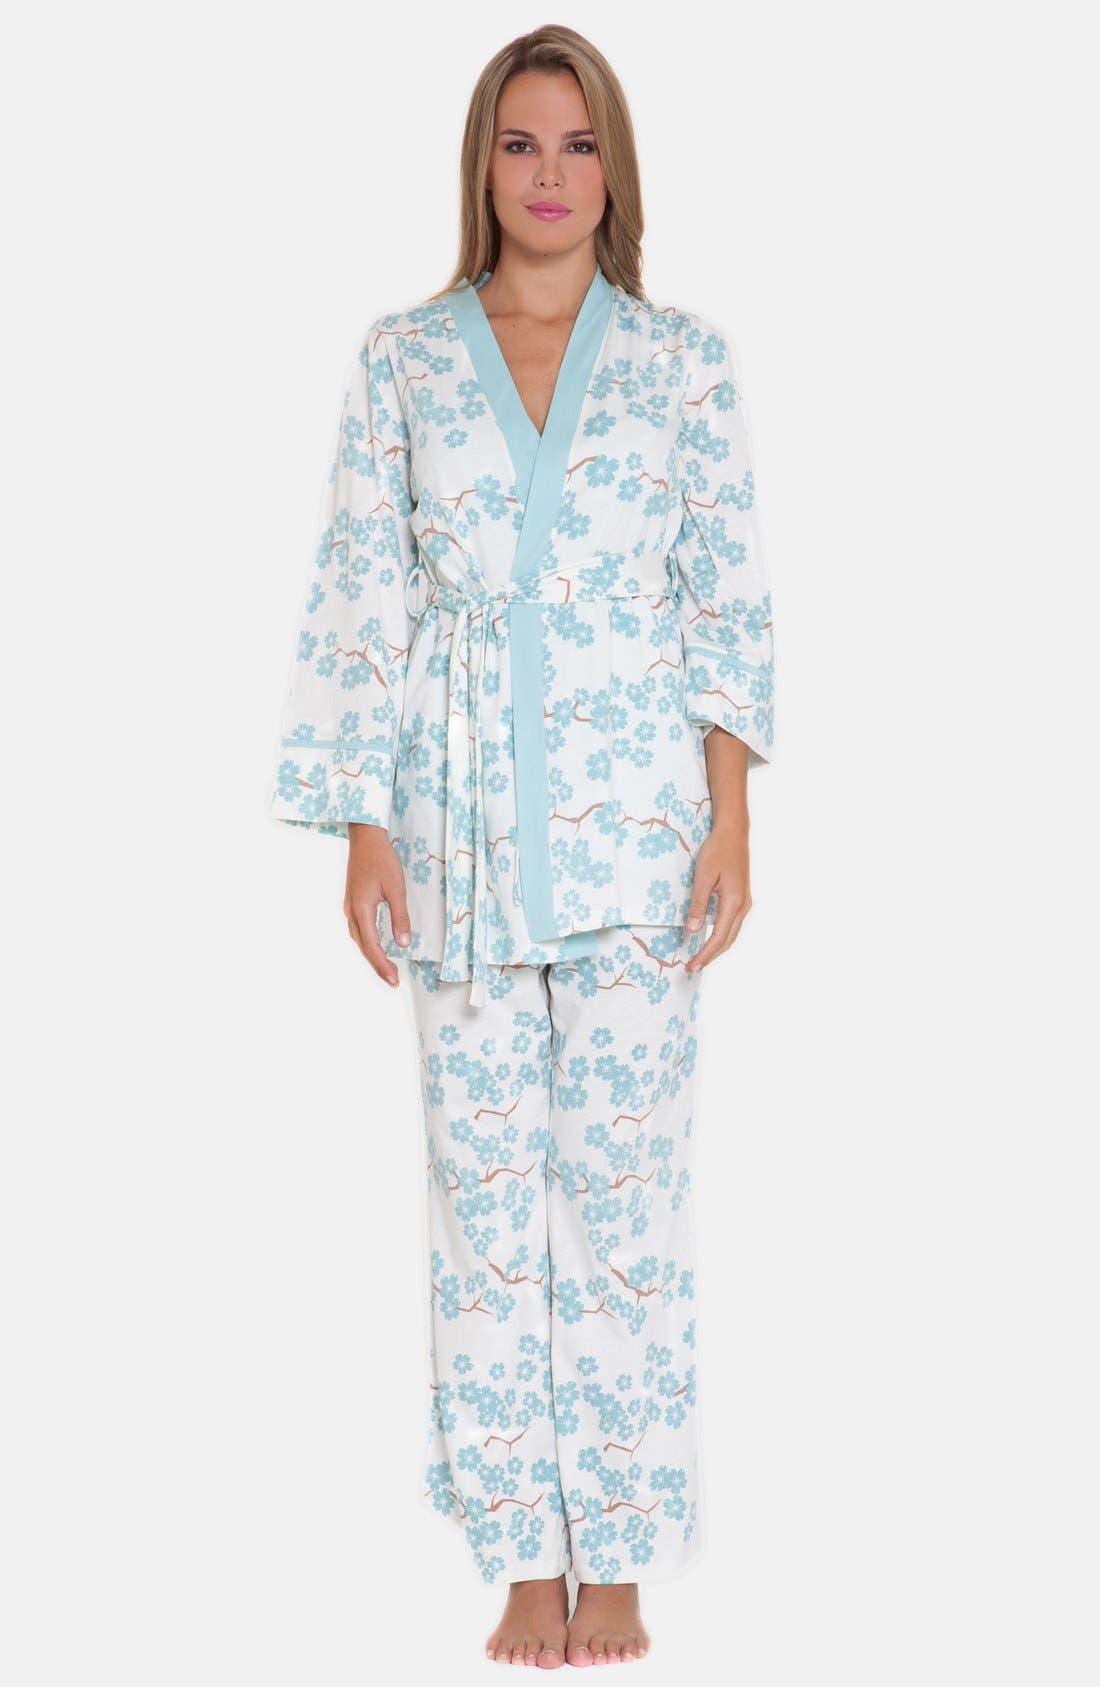 4-Piece Maternity Sleepwear Gift Set,                             Alternate thumbnail 4, color,